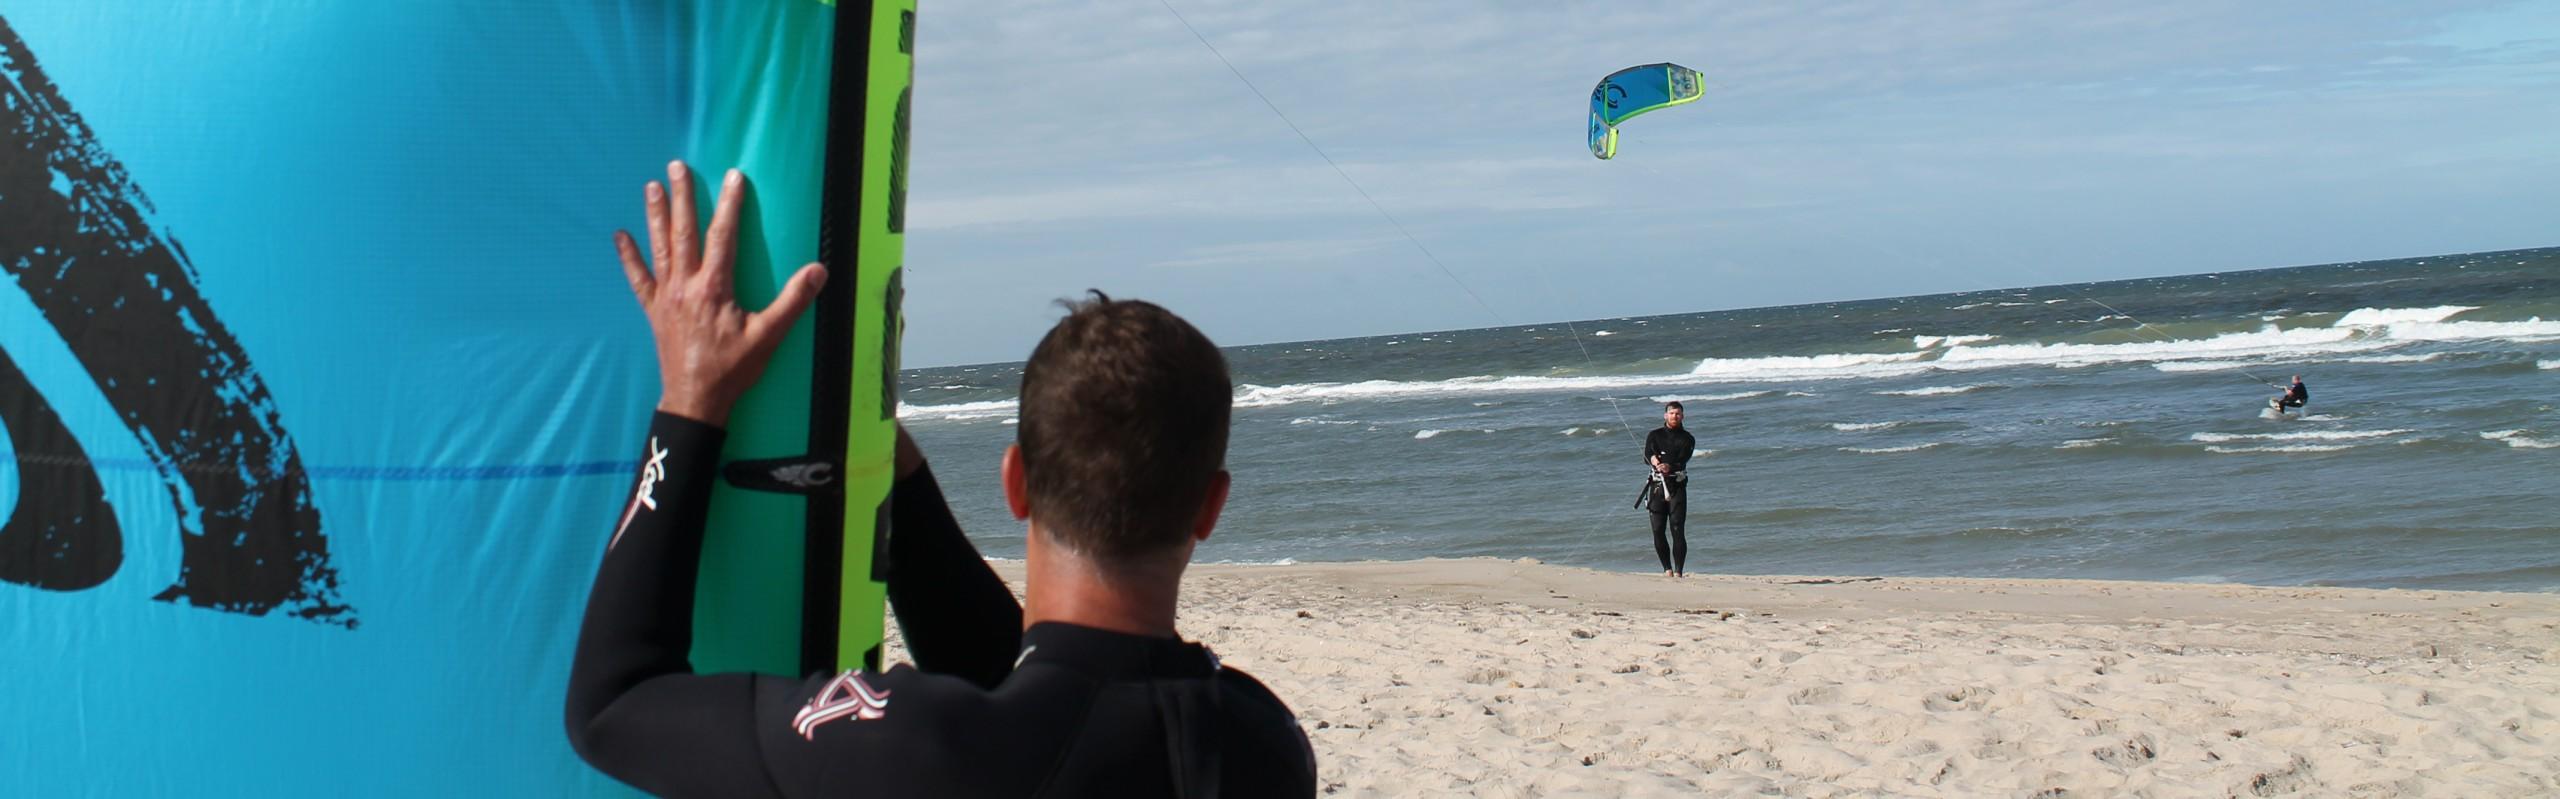 Kiteschule Sylt| Kitesurfen lernen an der Nordsee in Wenningstedt & Hoernum